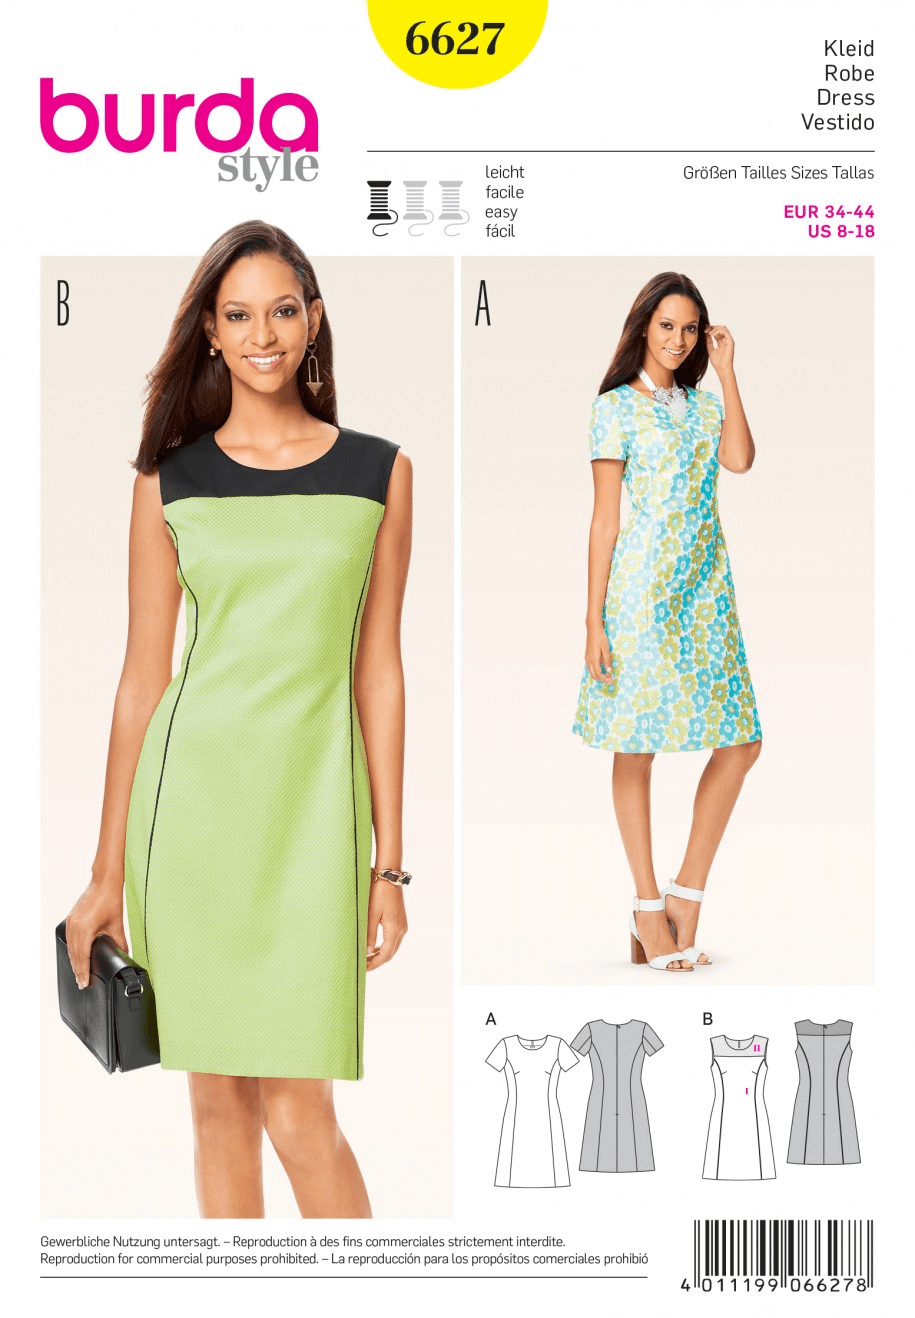 Misses Panel Seam Round Neck Dress Burda Sewing Pattern 6627